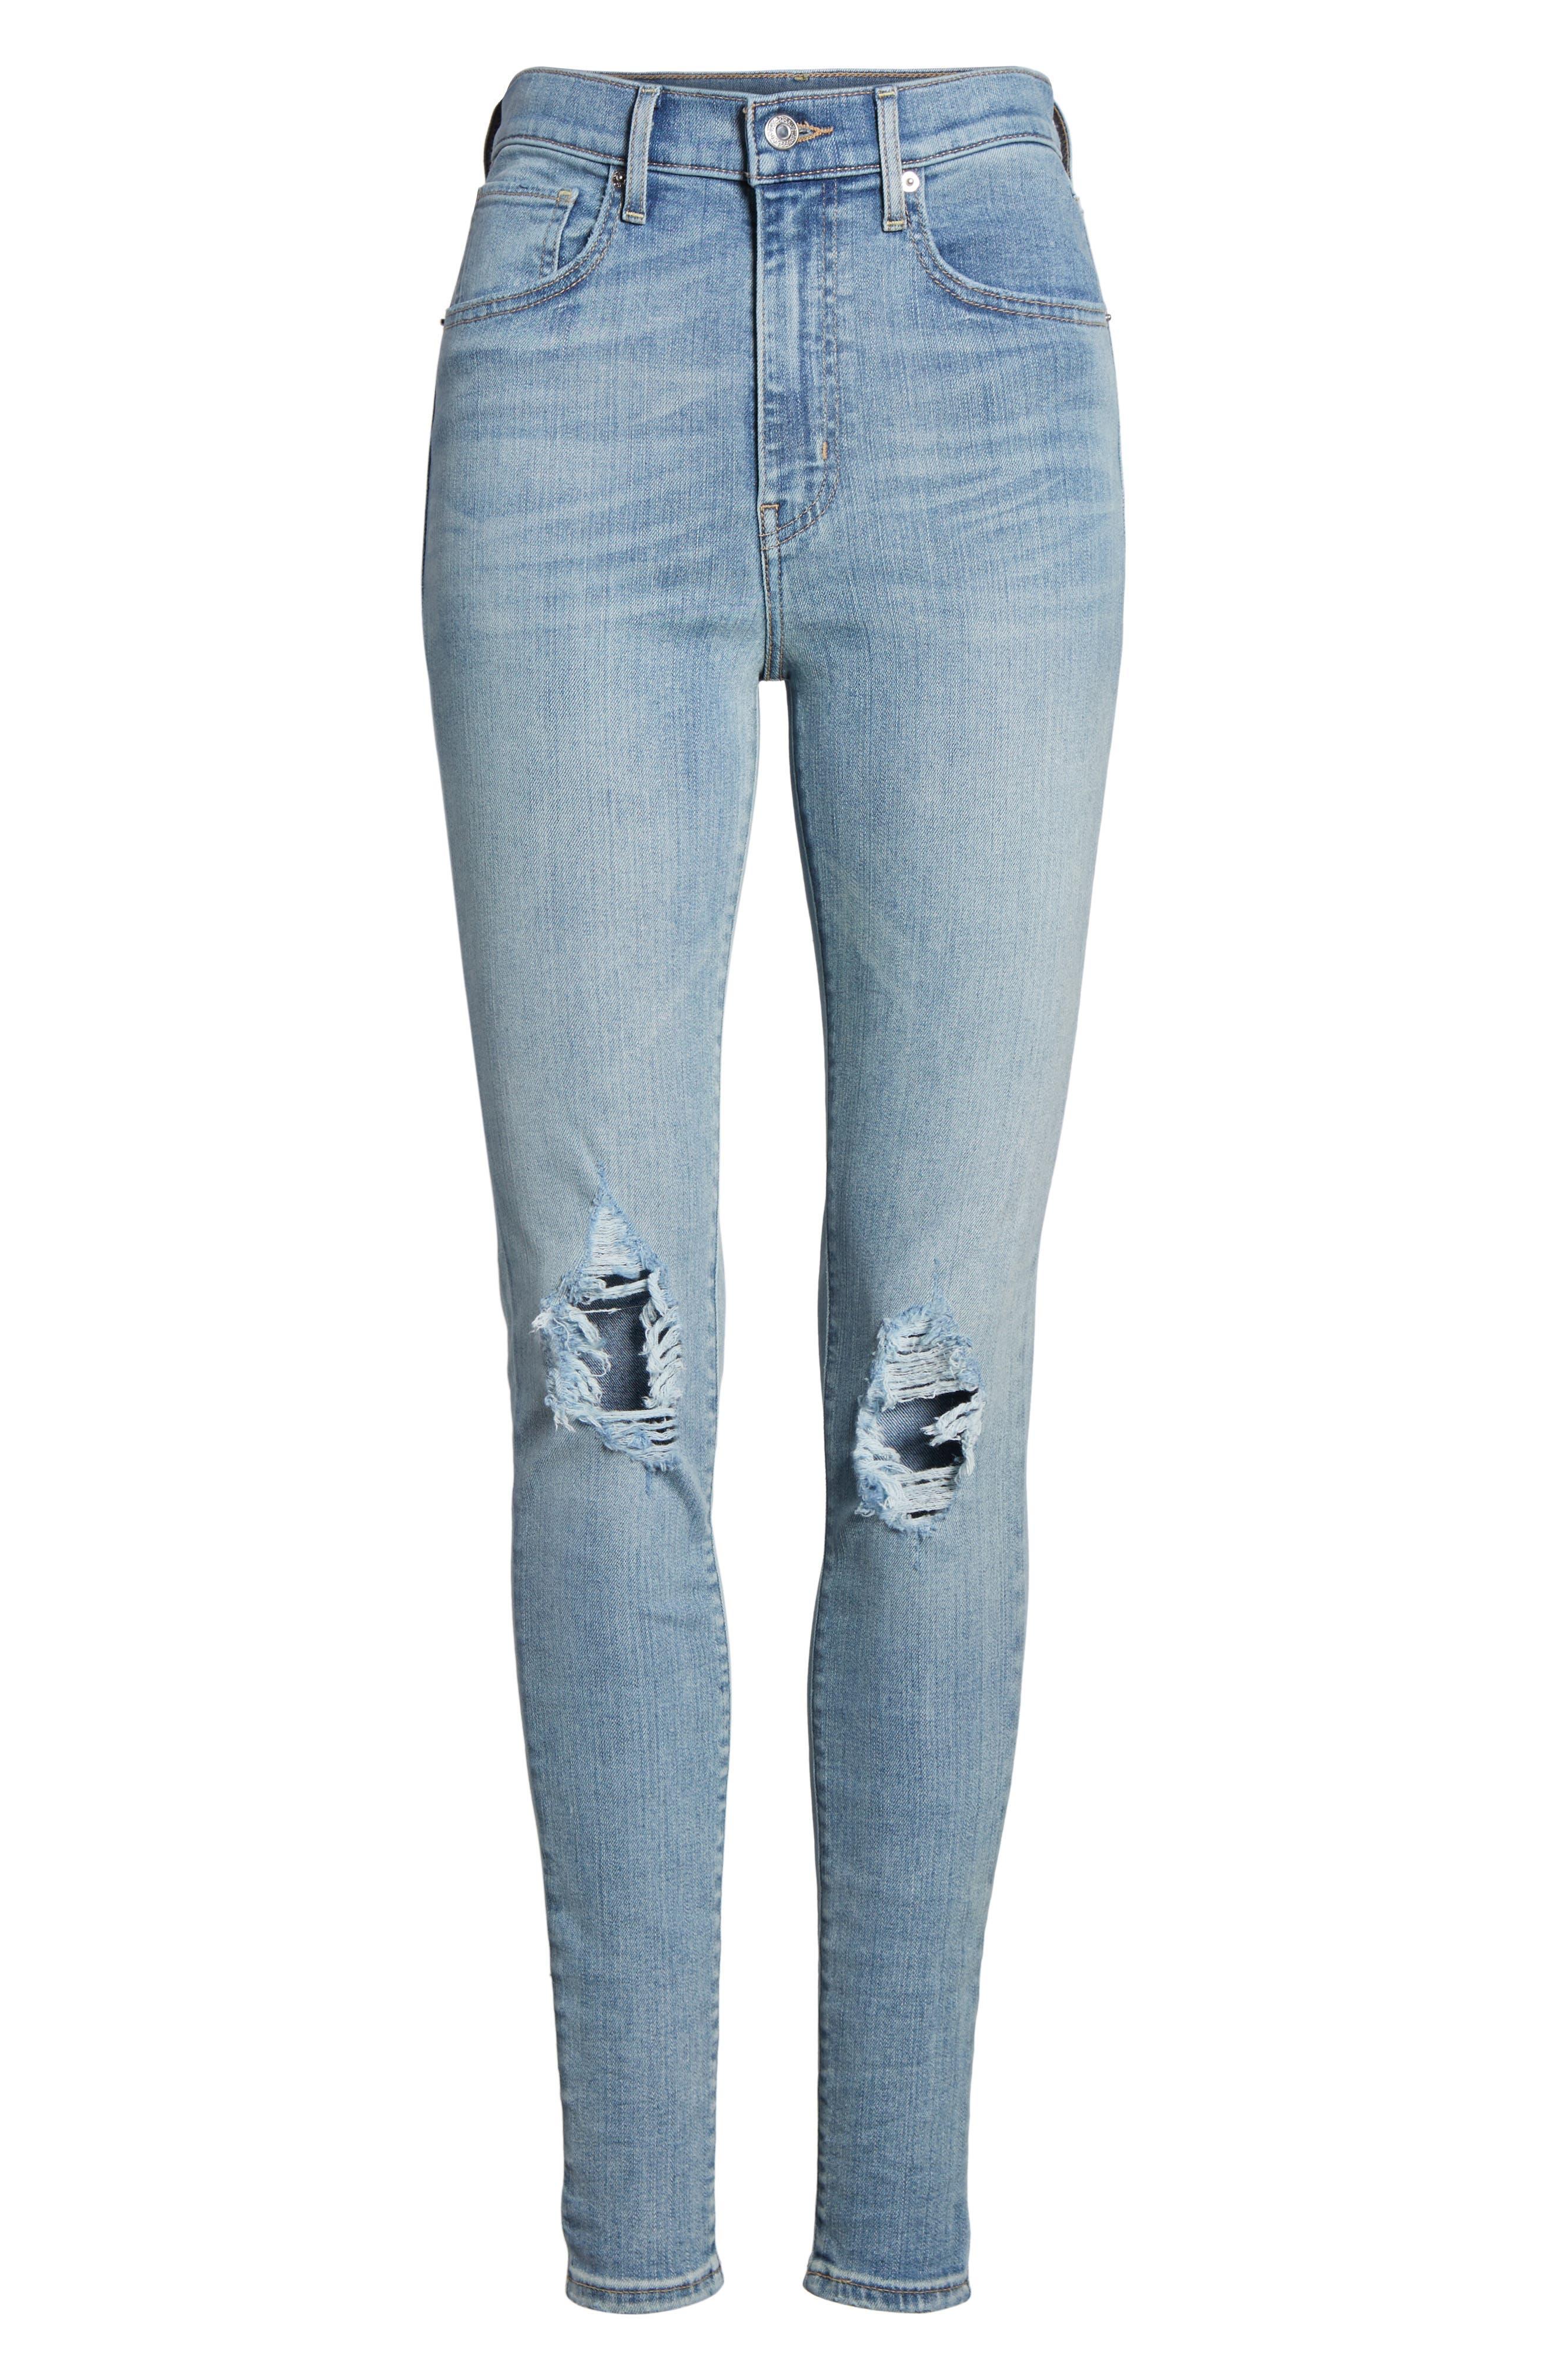 Mile High Super Skinny Jeans,                             Alternate thumbnail 7, color,                             Prime Time